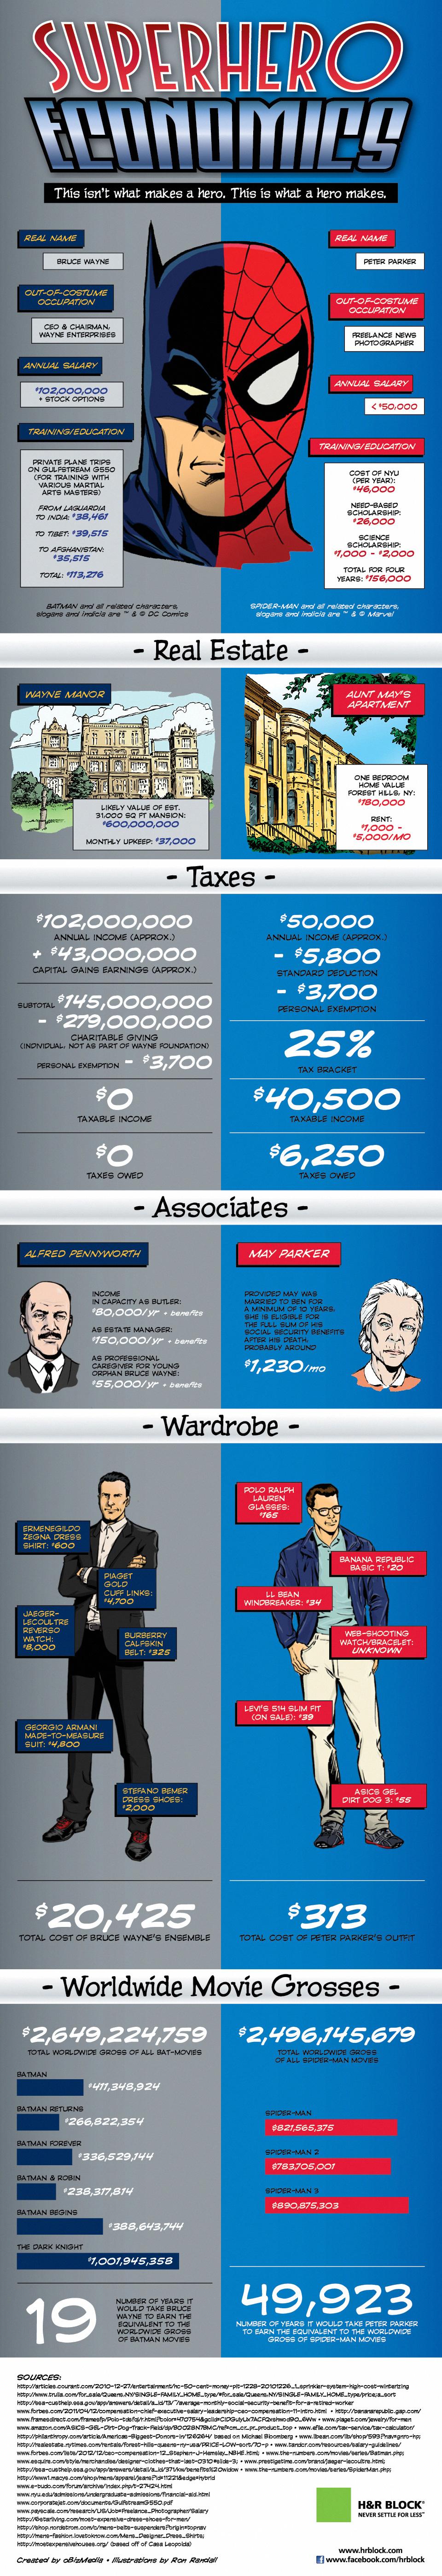 Superhero-Economics.jpg